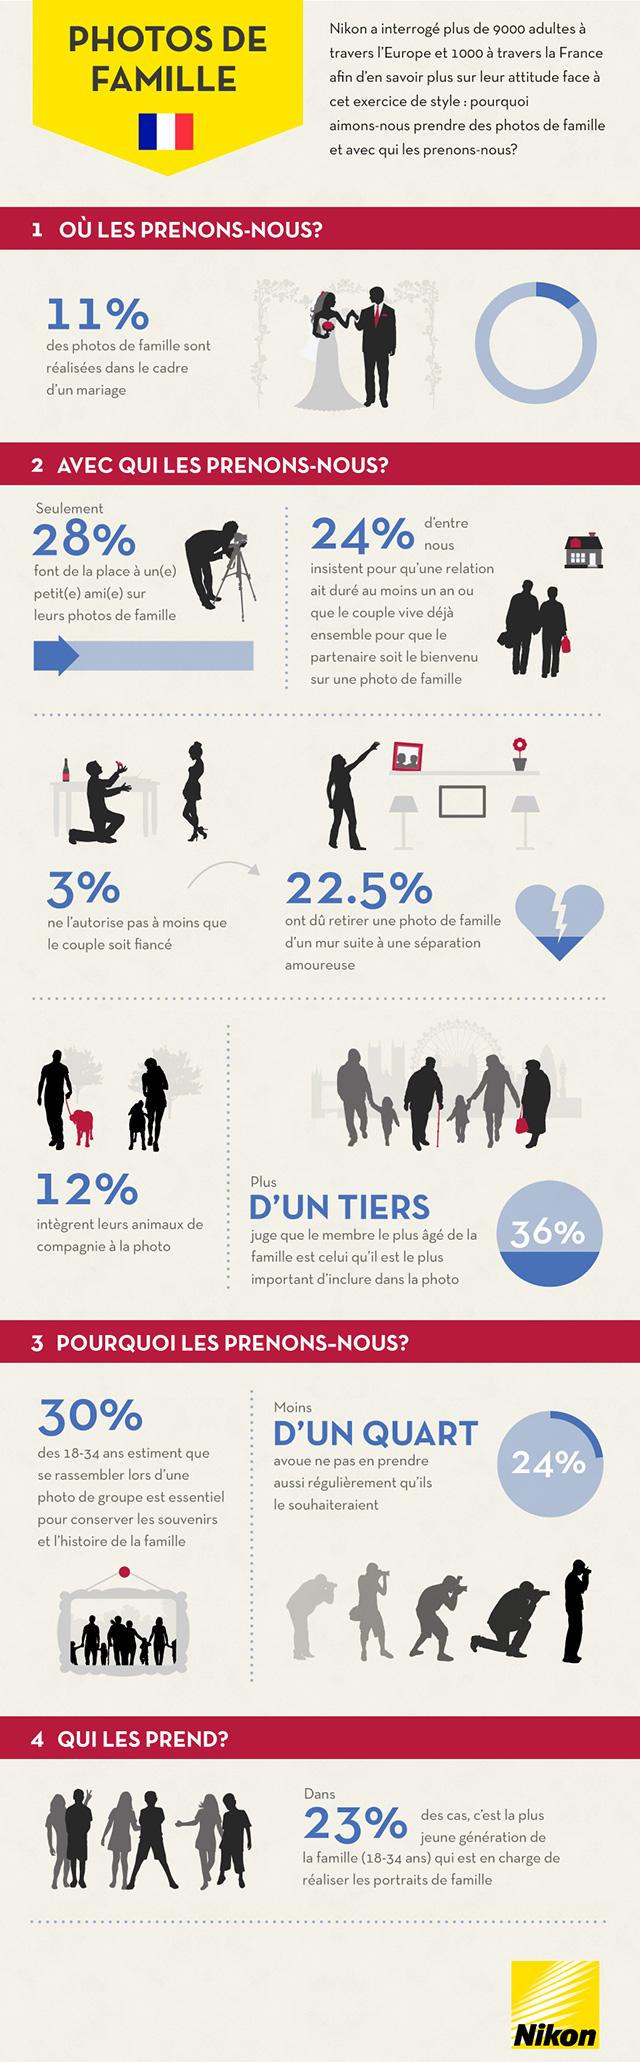 Infographie Nikon : all